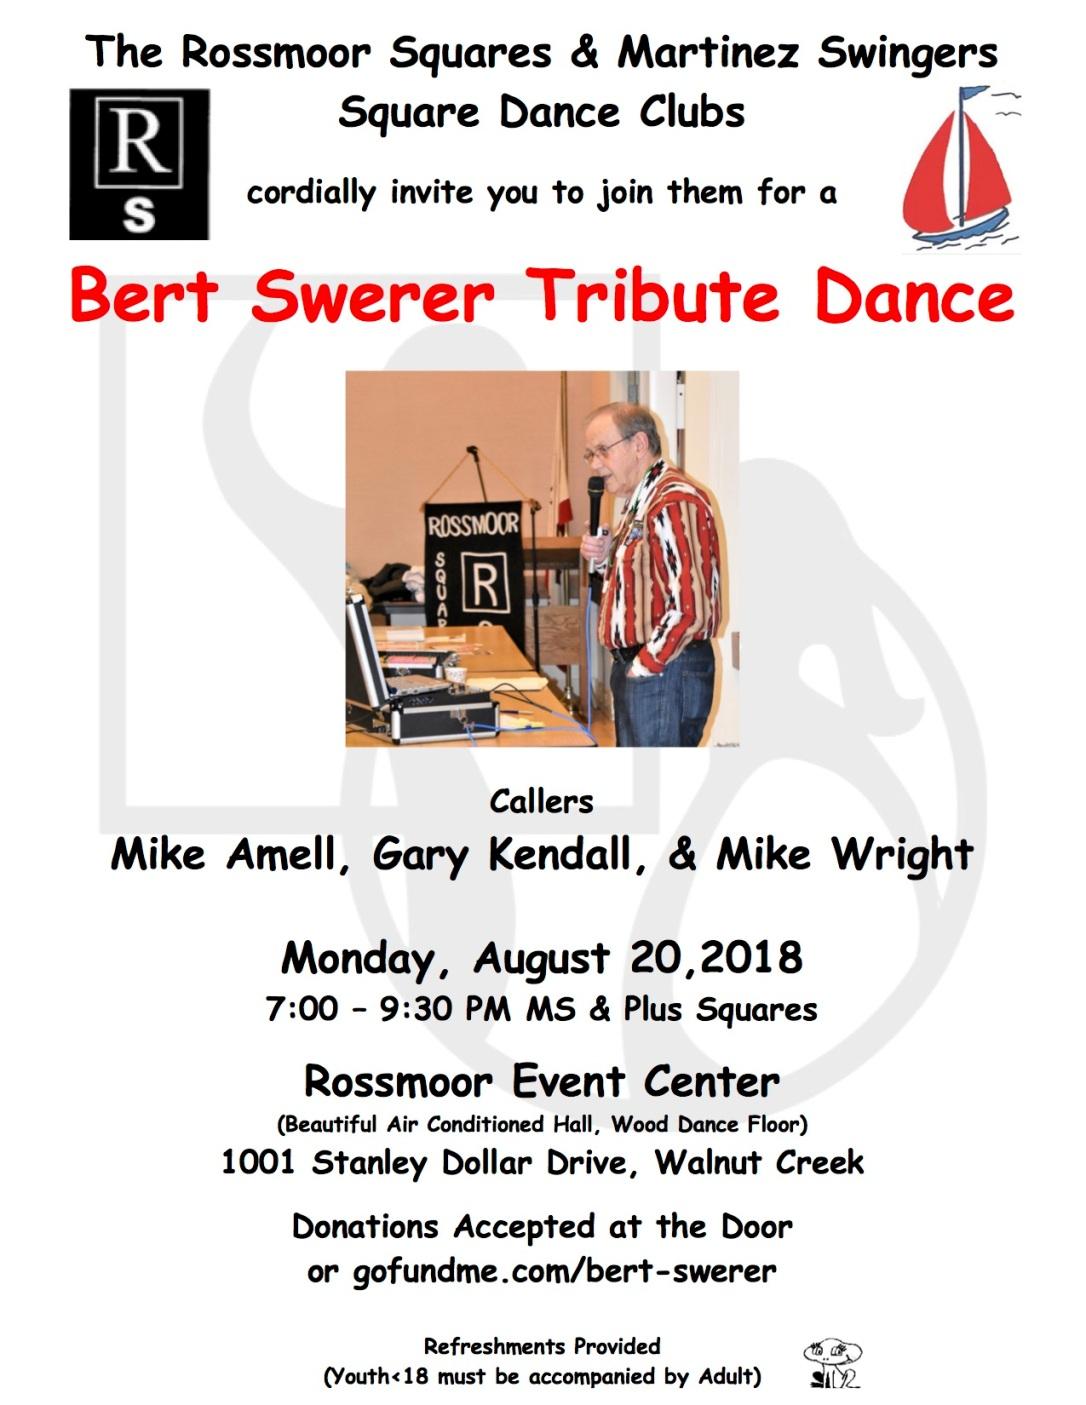 BertSwerer Tribute Dance